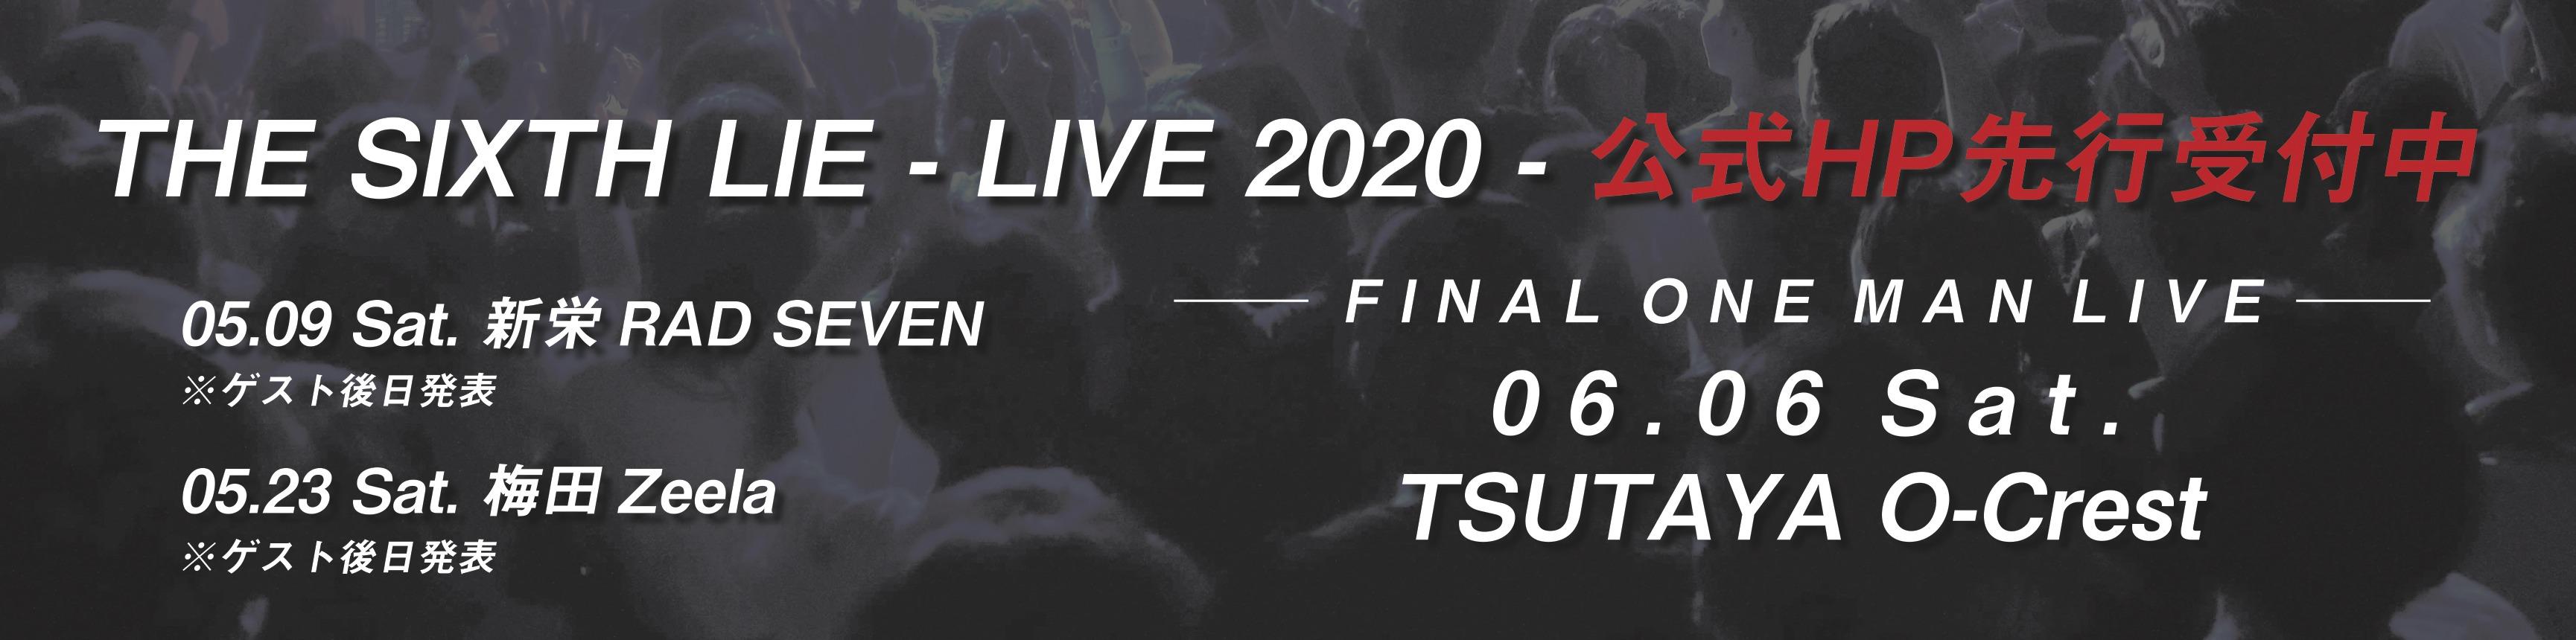 Bunner_live2020